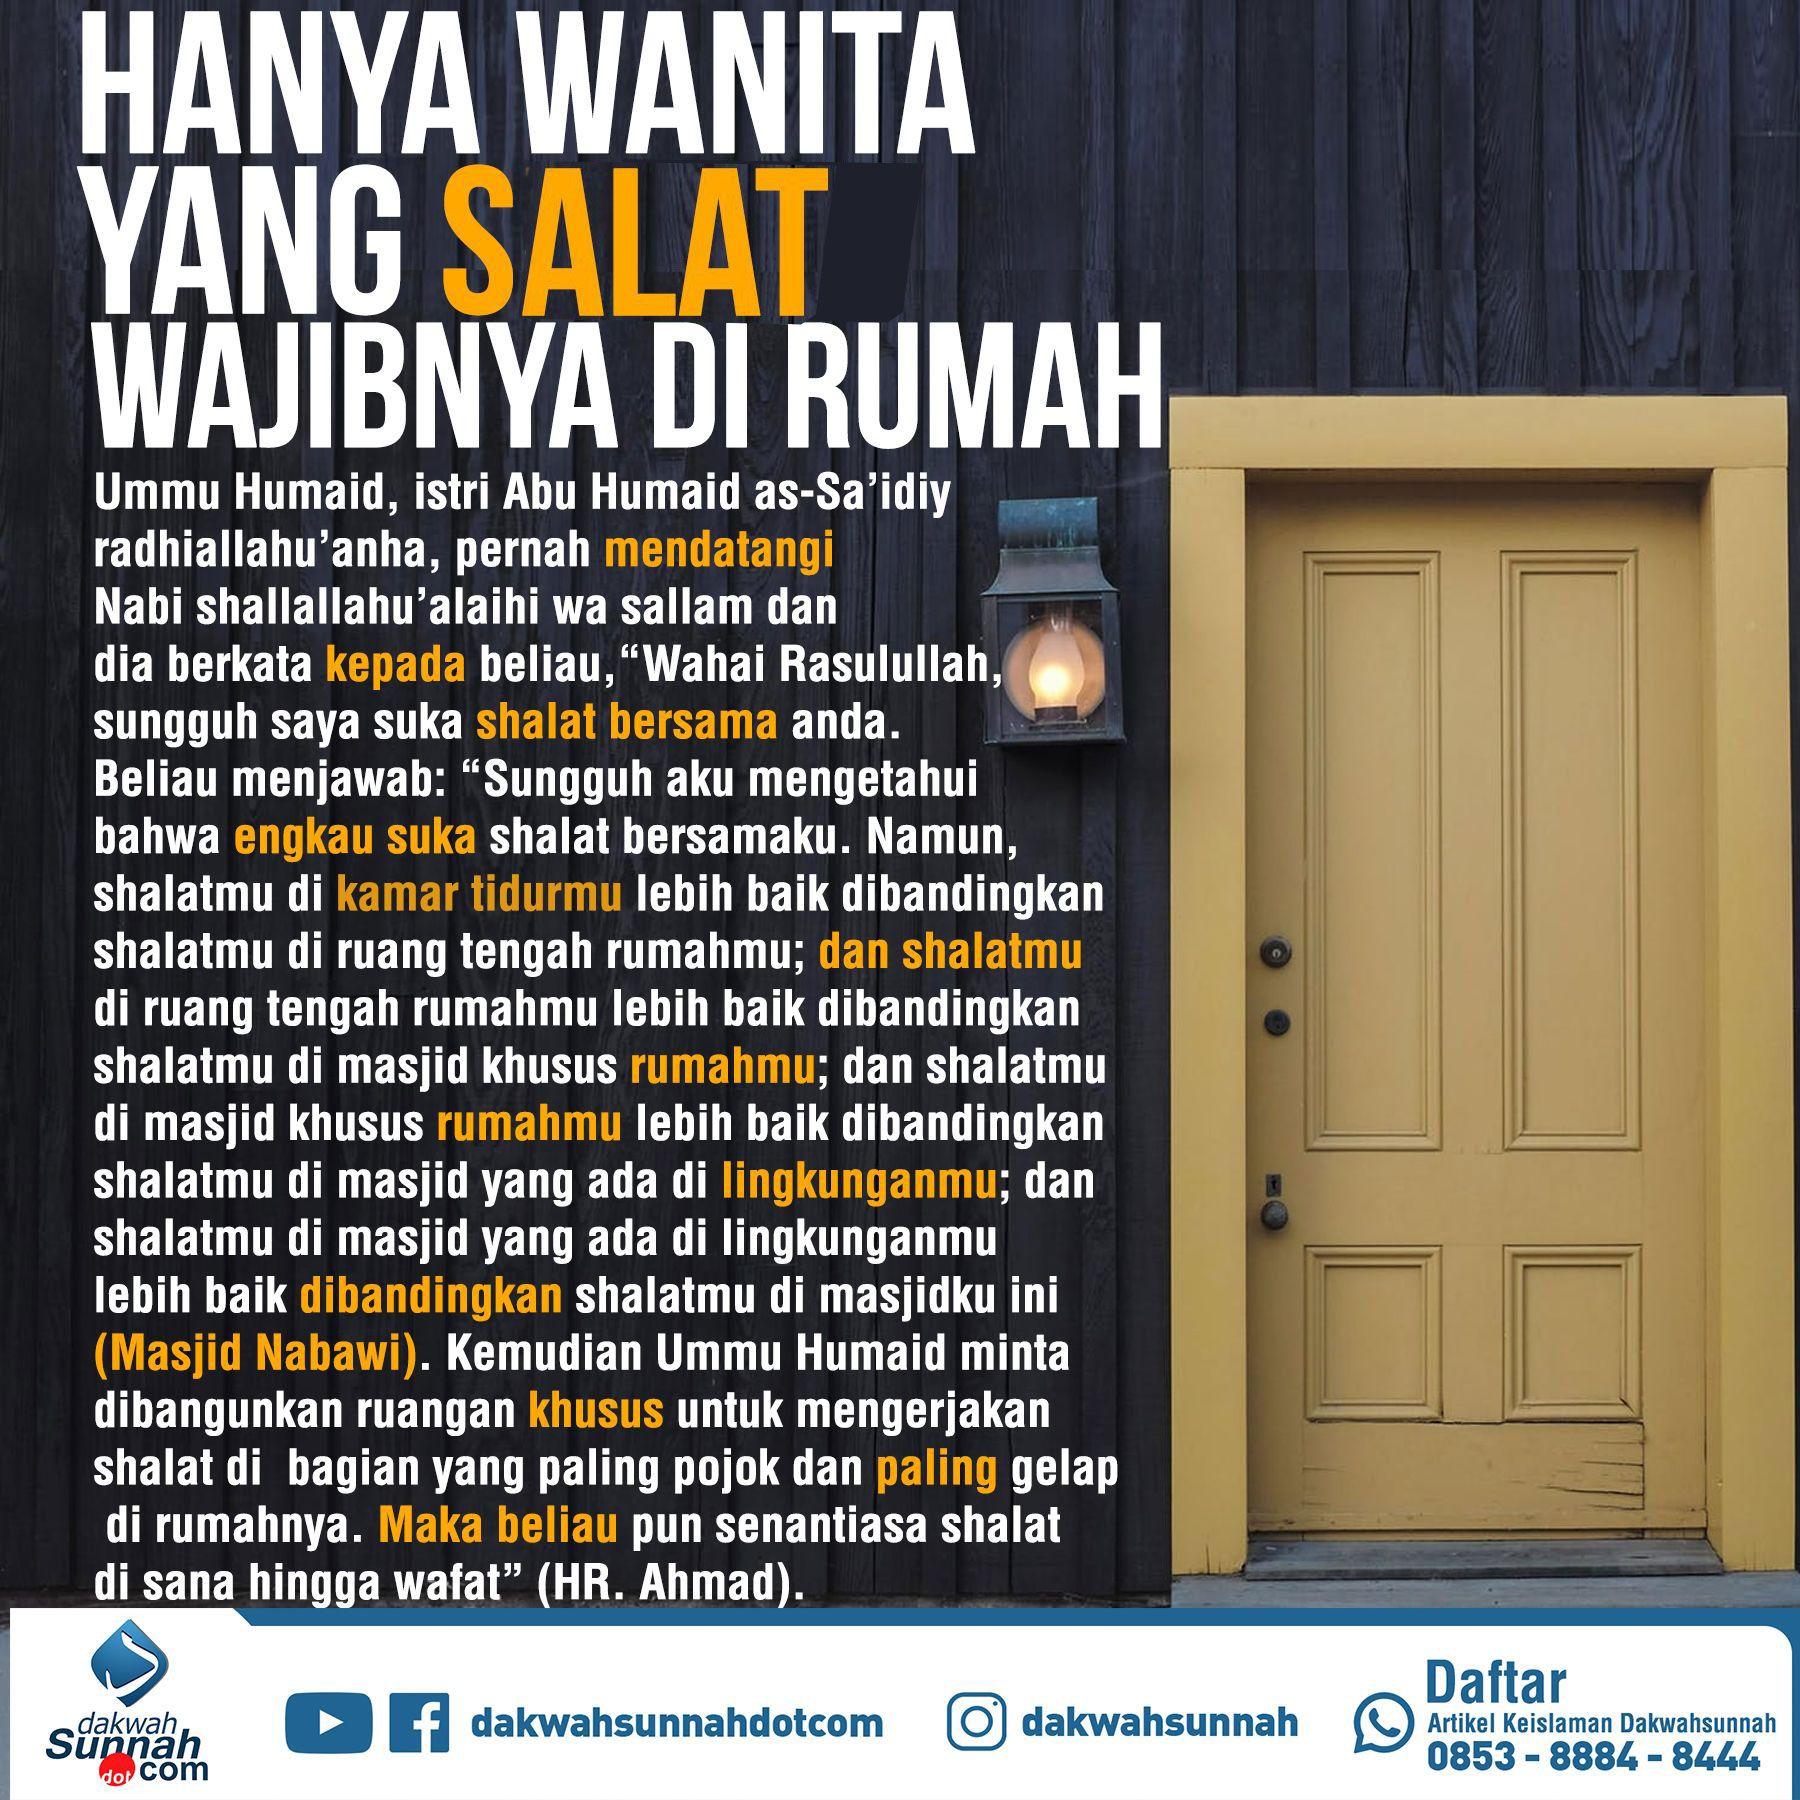 Kata Mutiara Sedih Menyentuh Hati Wanita   Kata Mutiara ...